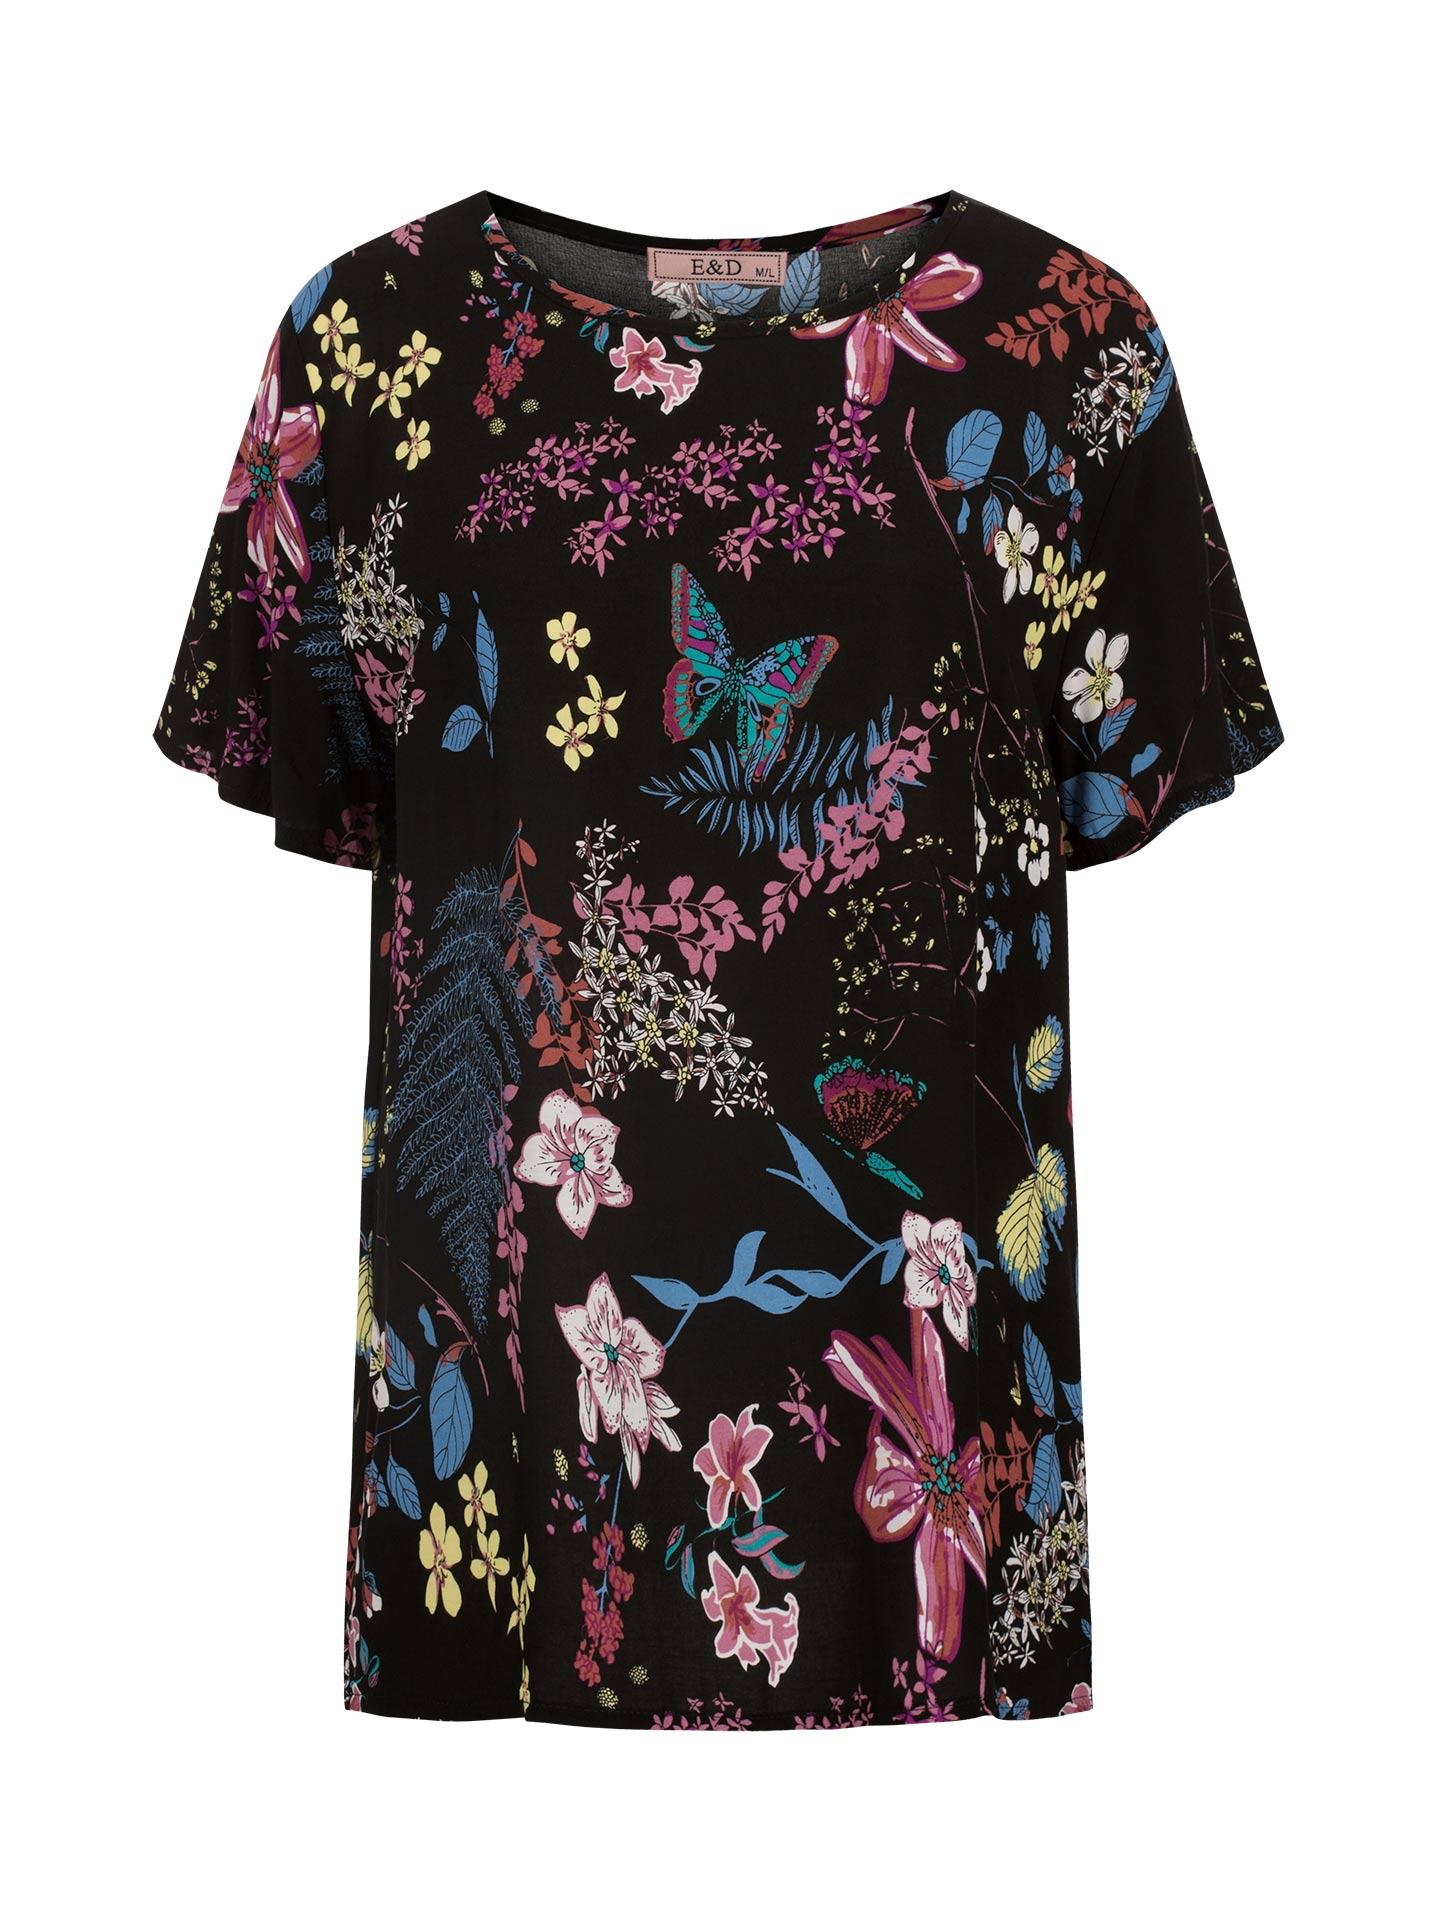 922938d217a9 Floral μπλούζα από βαμβάκι σε μαυρο